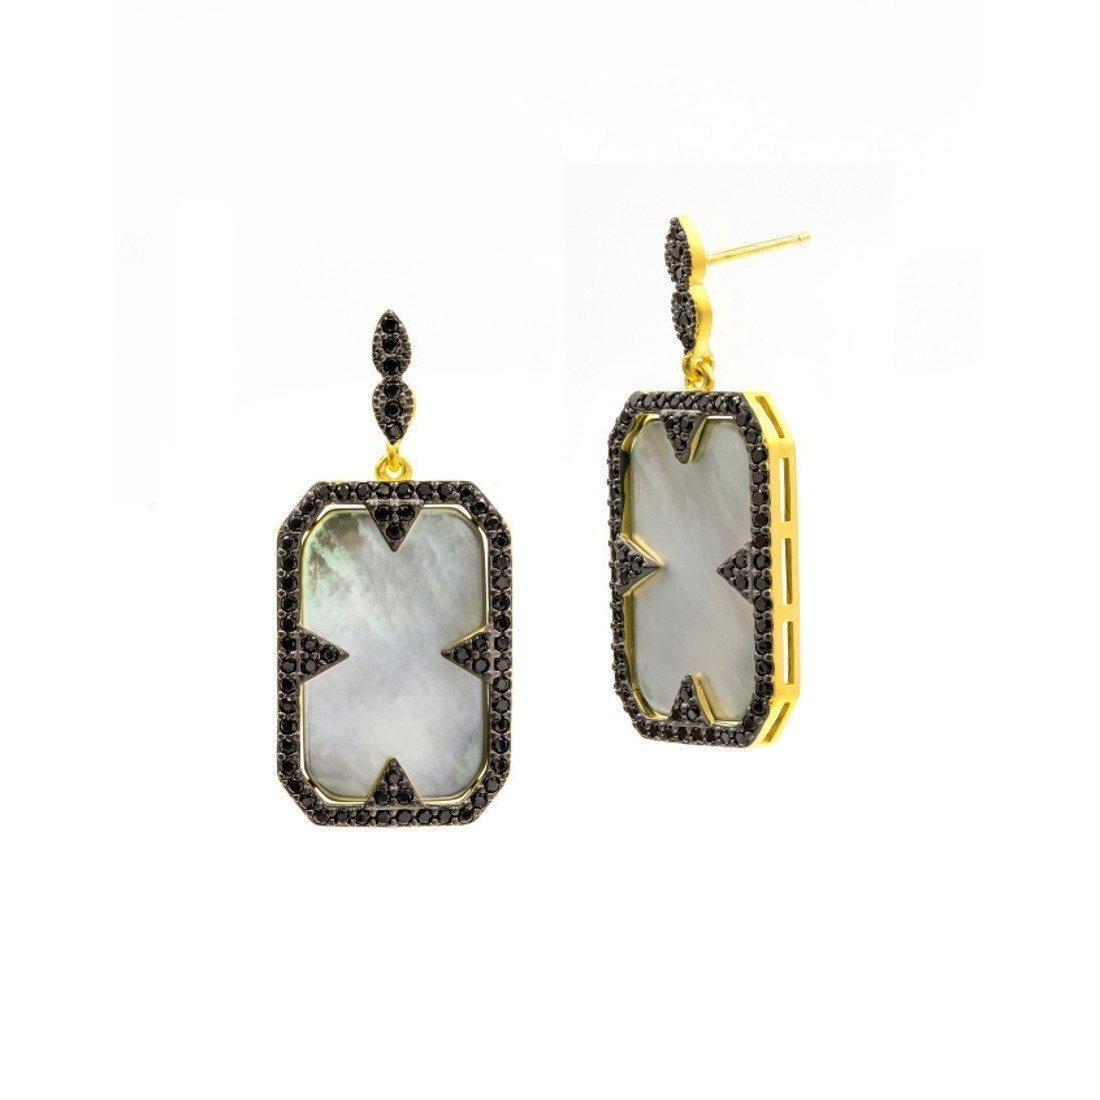 Freida Rothman Slated Noir Slice Drop Earrings A8XivY0h